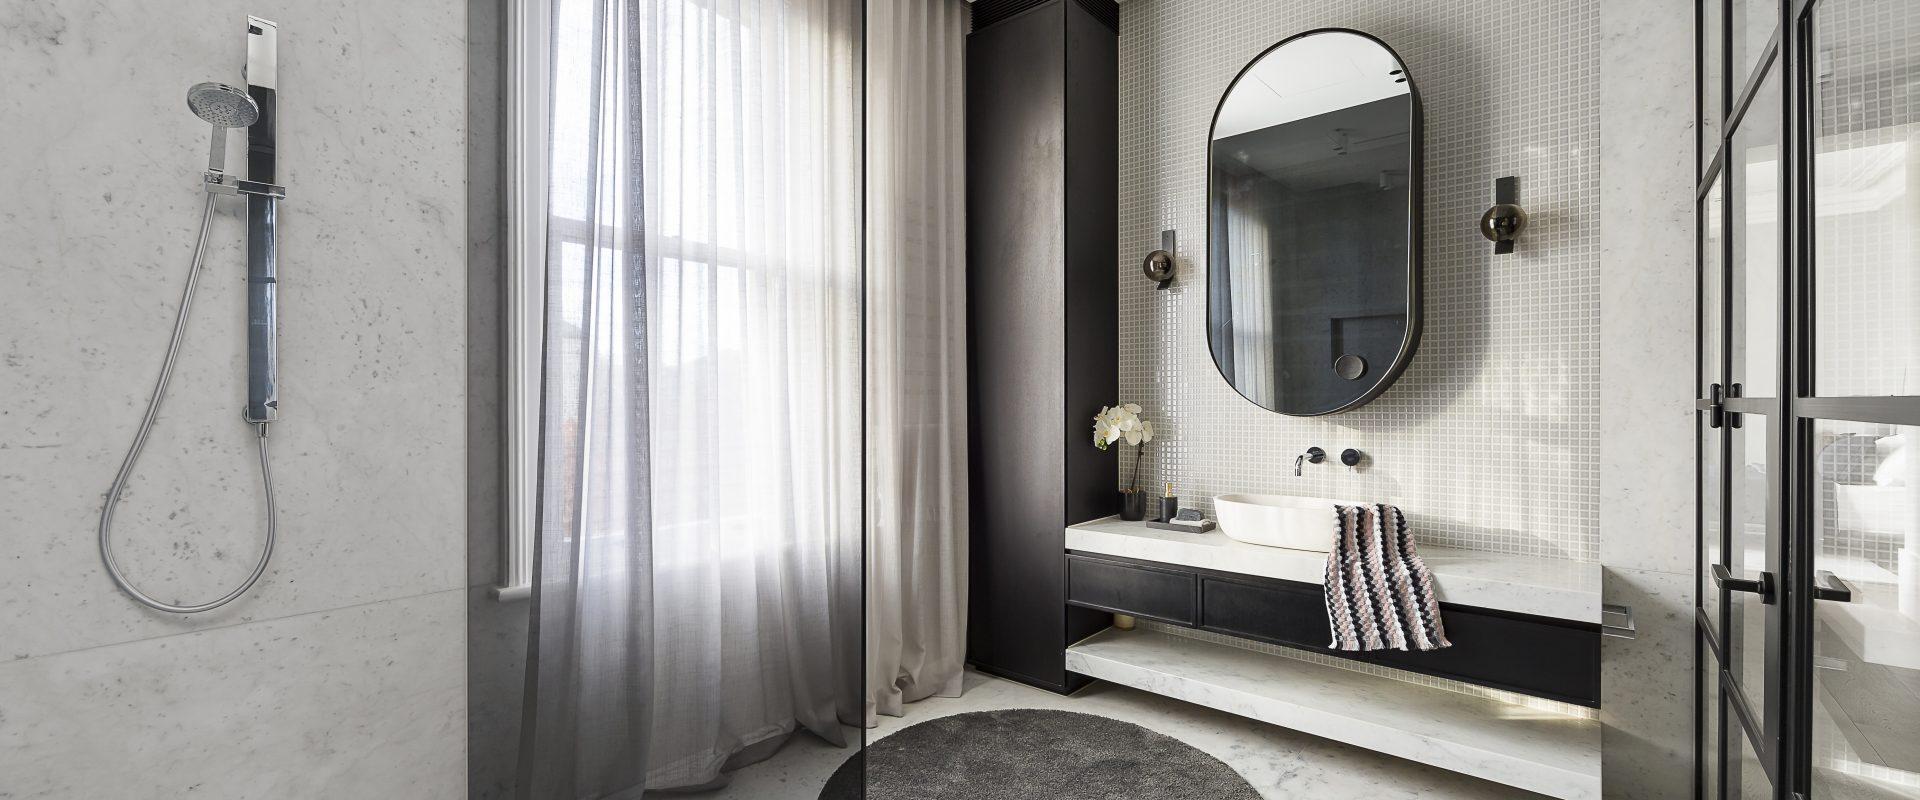 10 badkamertrends